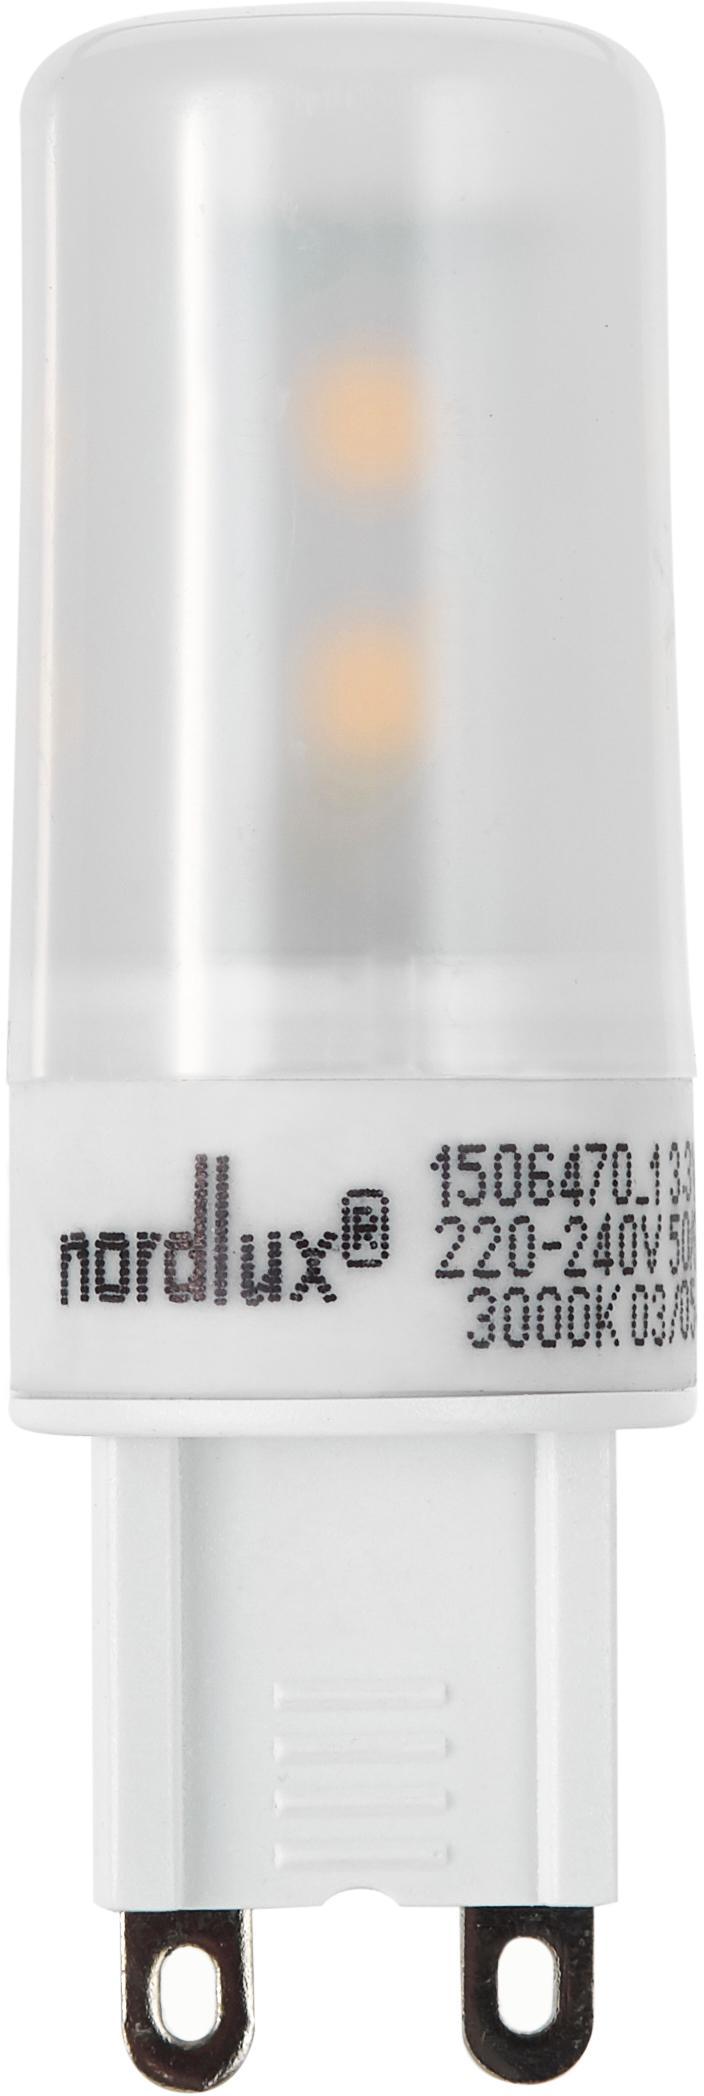 Lampadina a LED Gabriel (G9 / 3,3Watt) 5 pz, Paralume: materiale sintetico, Base lampadina: alluminio, Trasparente, Ø 2 x Alt. 6 cm